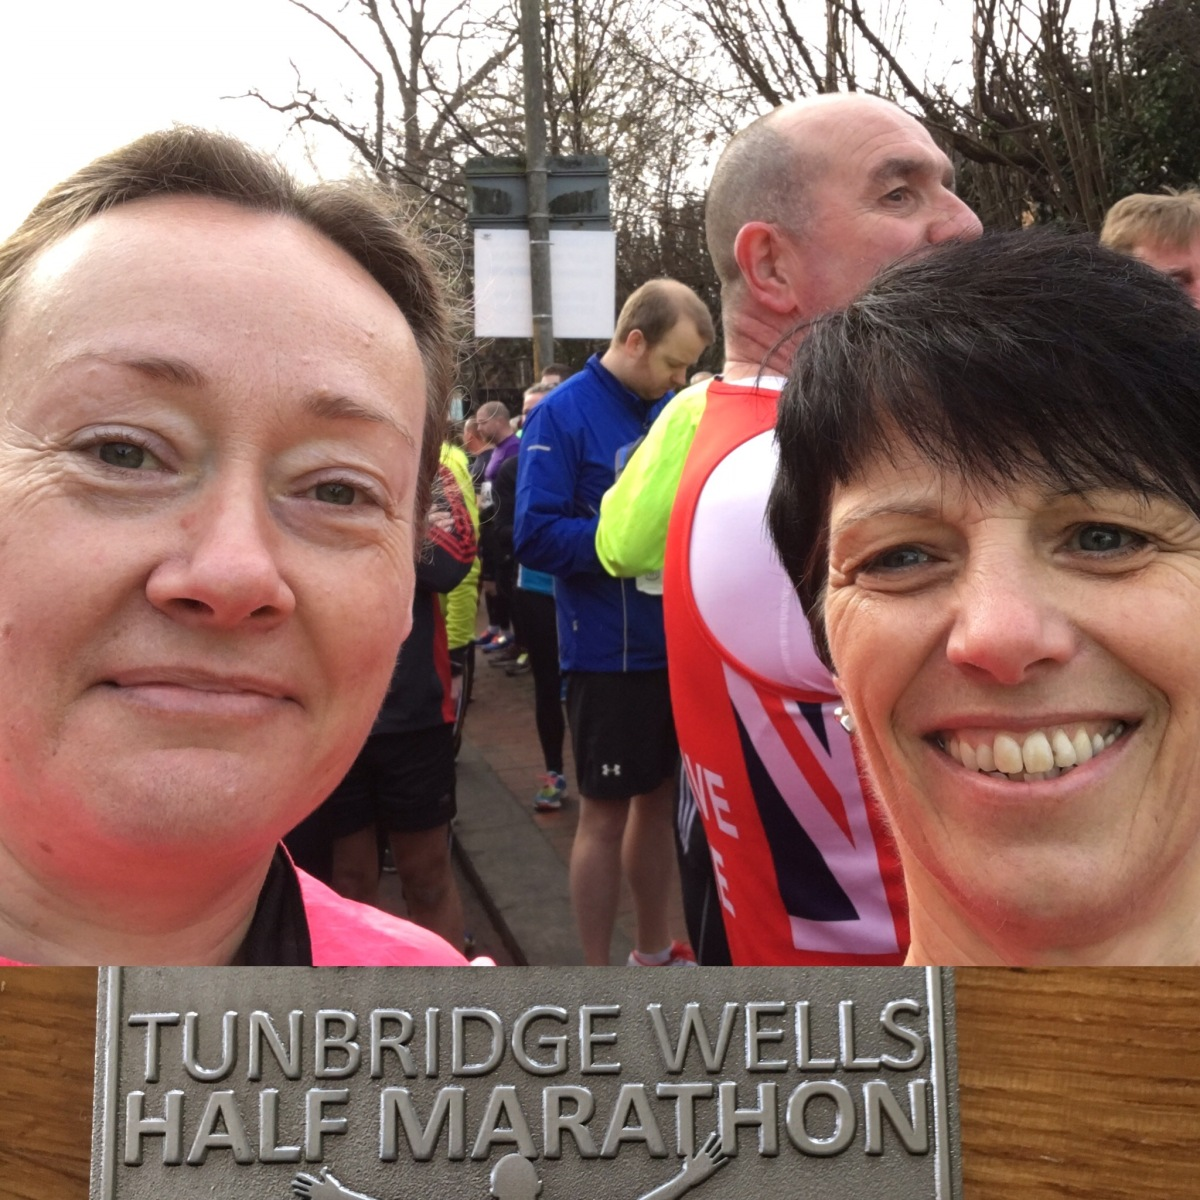 February – Tunbridge Wells HalfMarathon